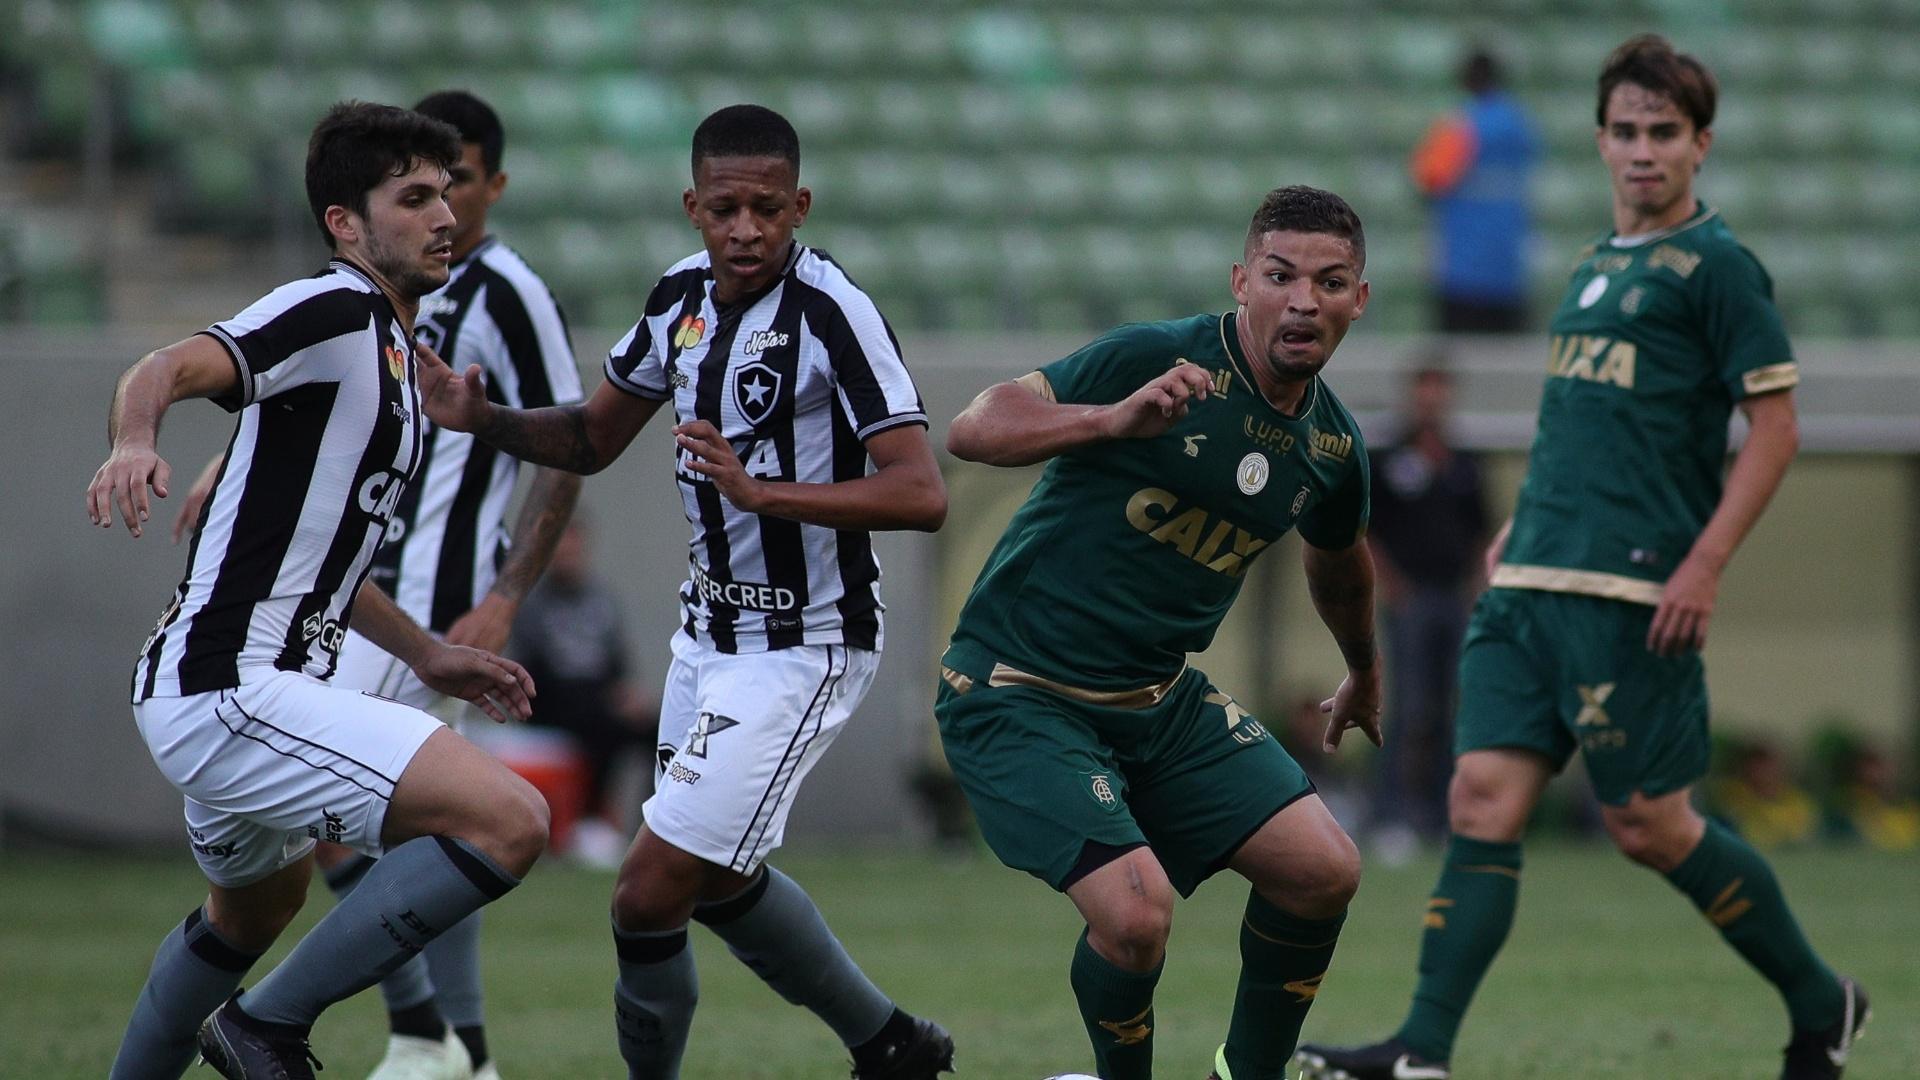 Judivan conduz a bola na partida América-MG x Botafogo pelo Campeonato Brasileiro 2018